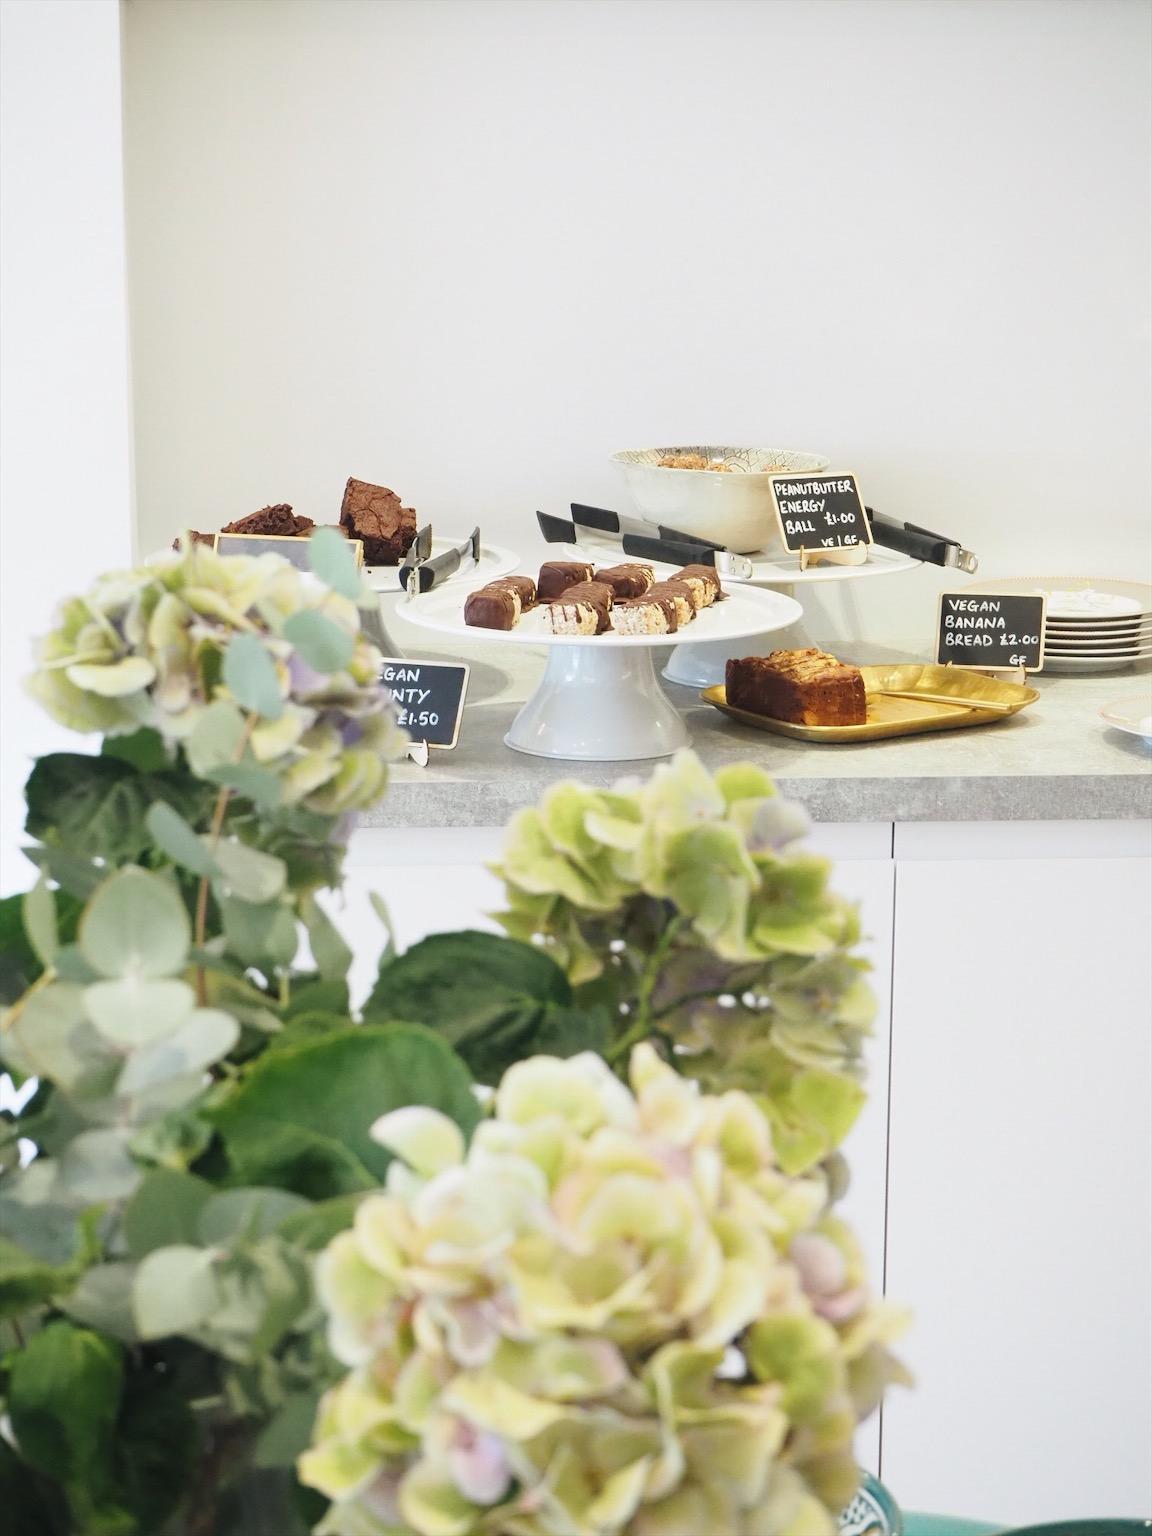 CAFFEINE FIX + LUNCHTIME FEAST - OPEN HOUSE DELI X ALRESFORD LINEN